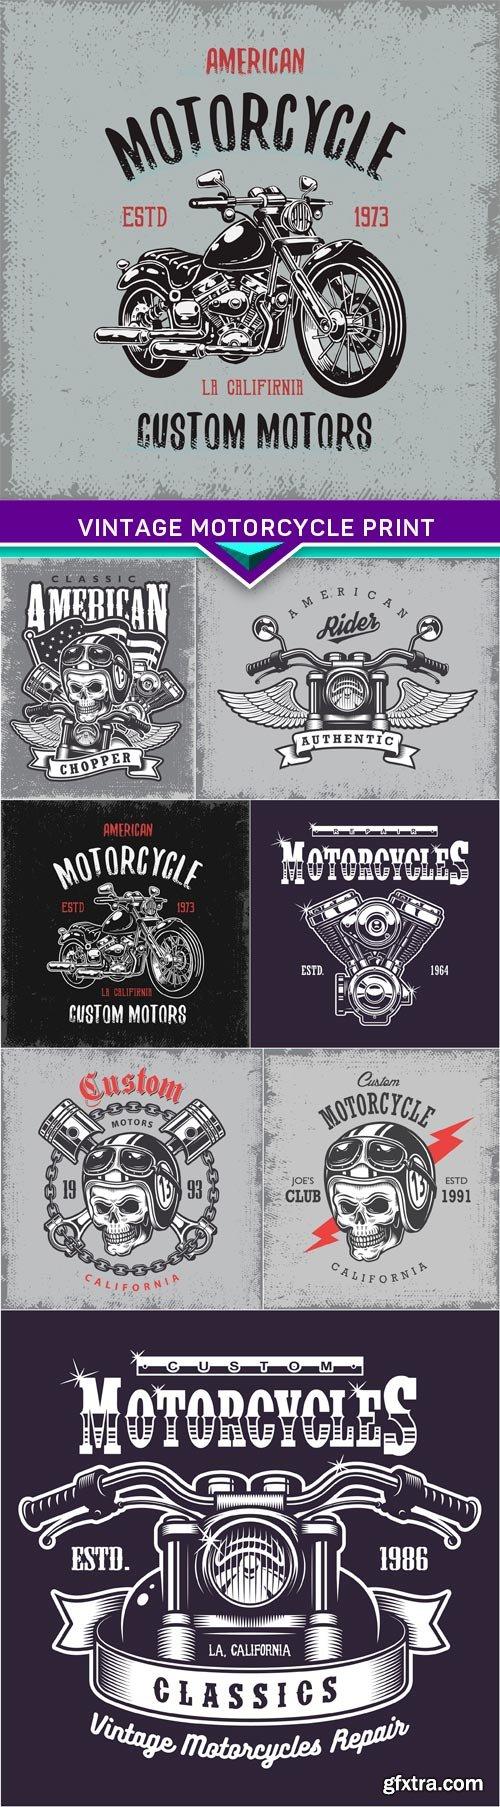 Vintage motorcycle print on grunge background 8X EPS